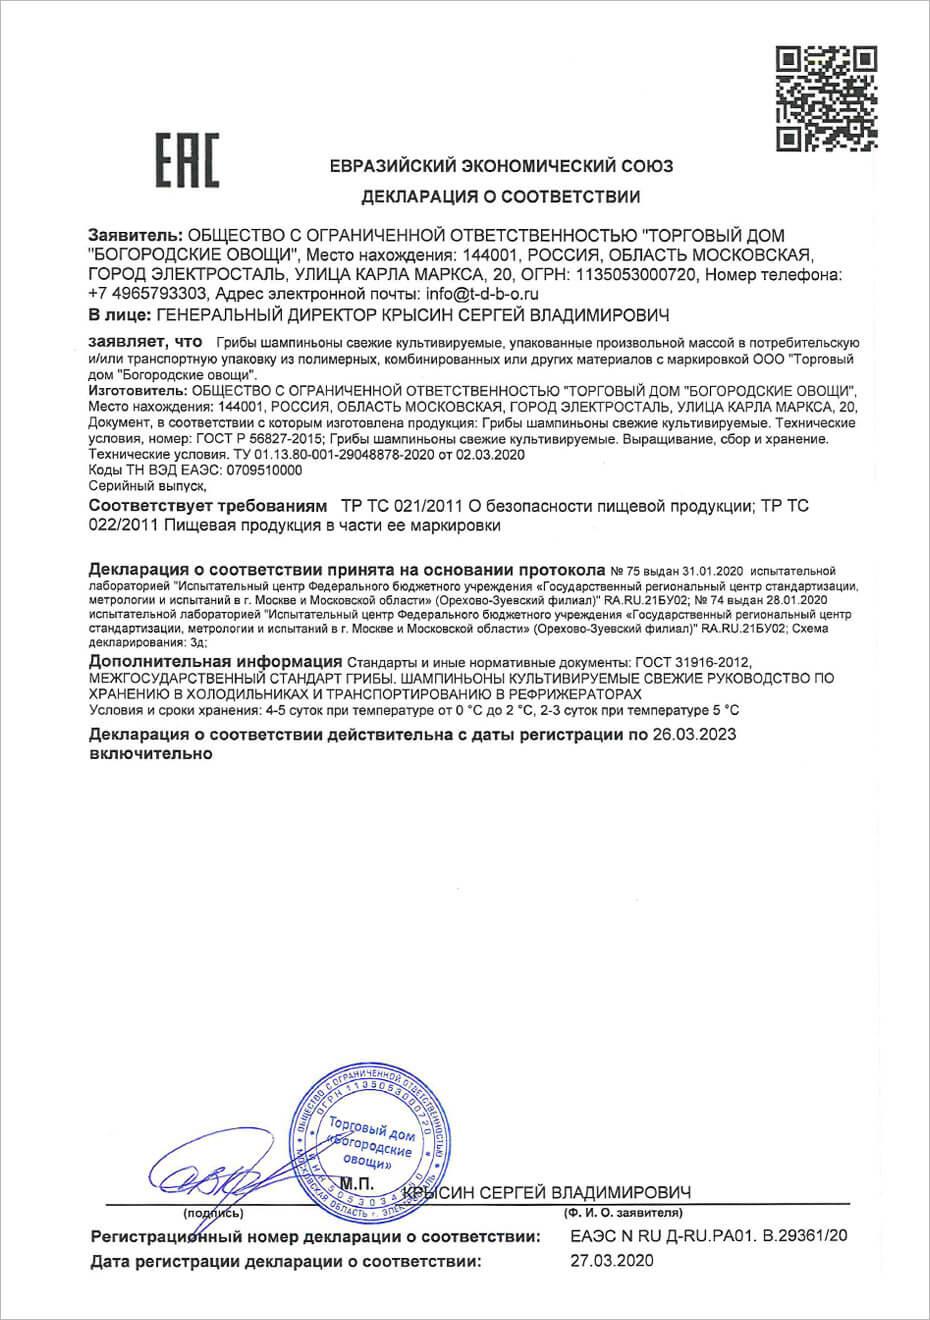 deklr_sootvet